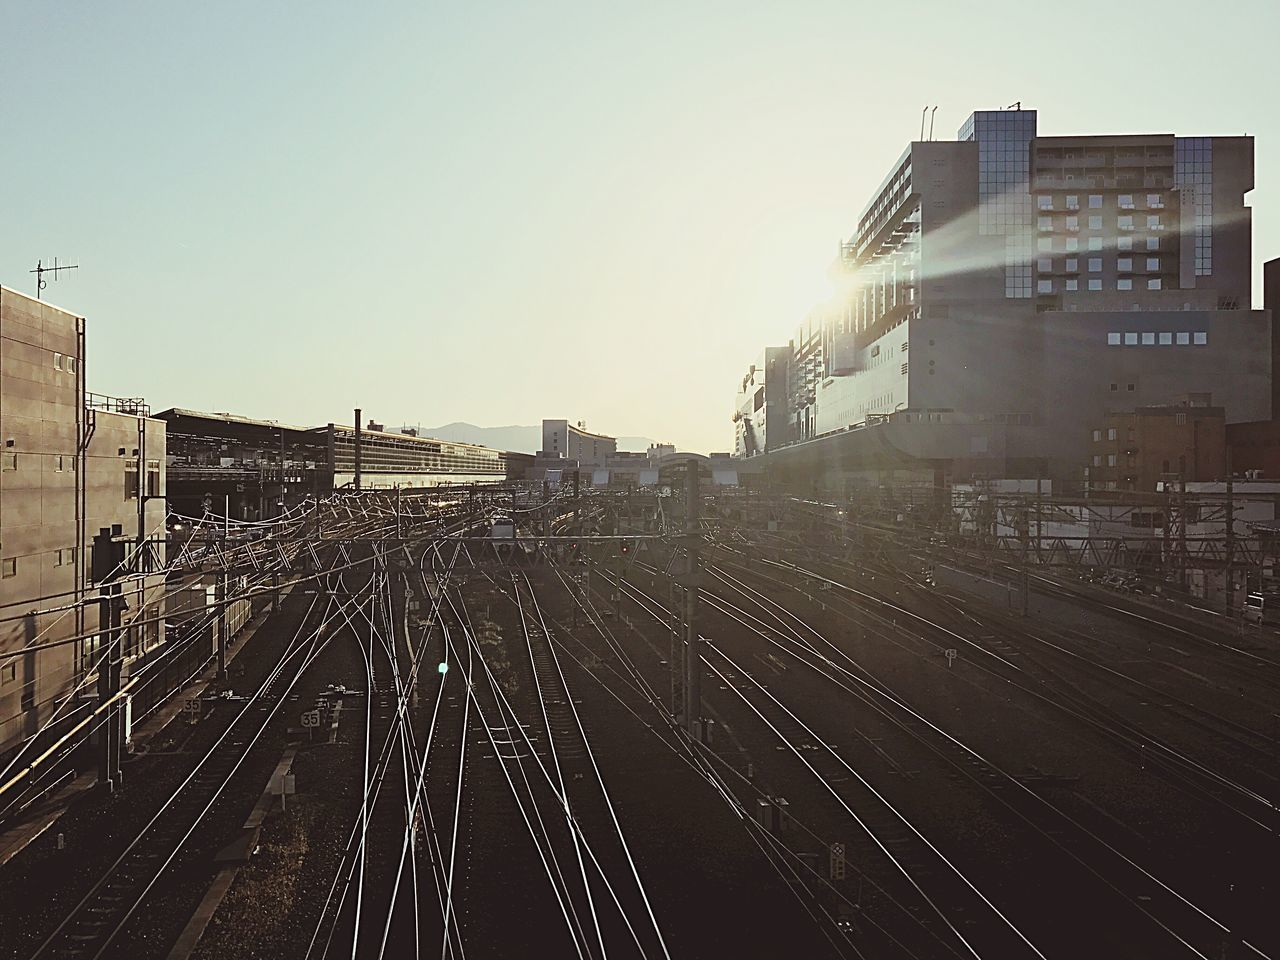 kyoto station Kyoto Kyotostation Railway Japan Japanrailway Station